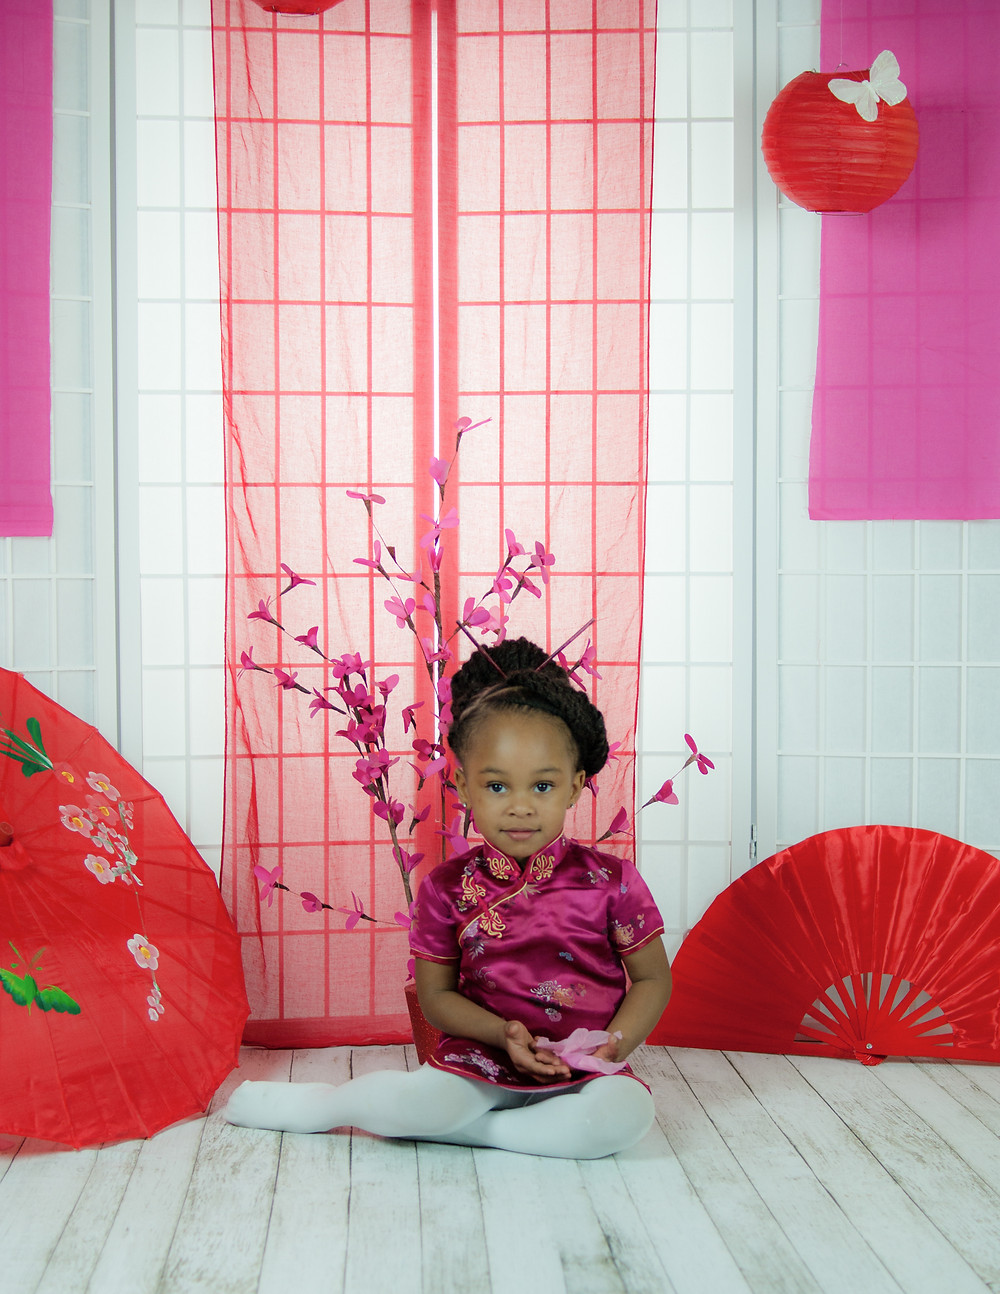 Alamogordo Photography - Children Photography